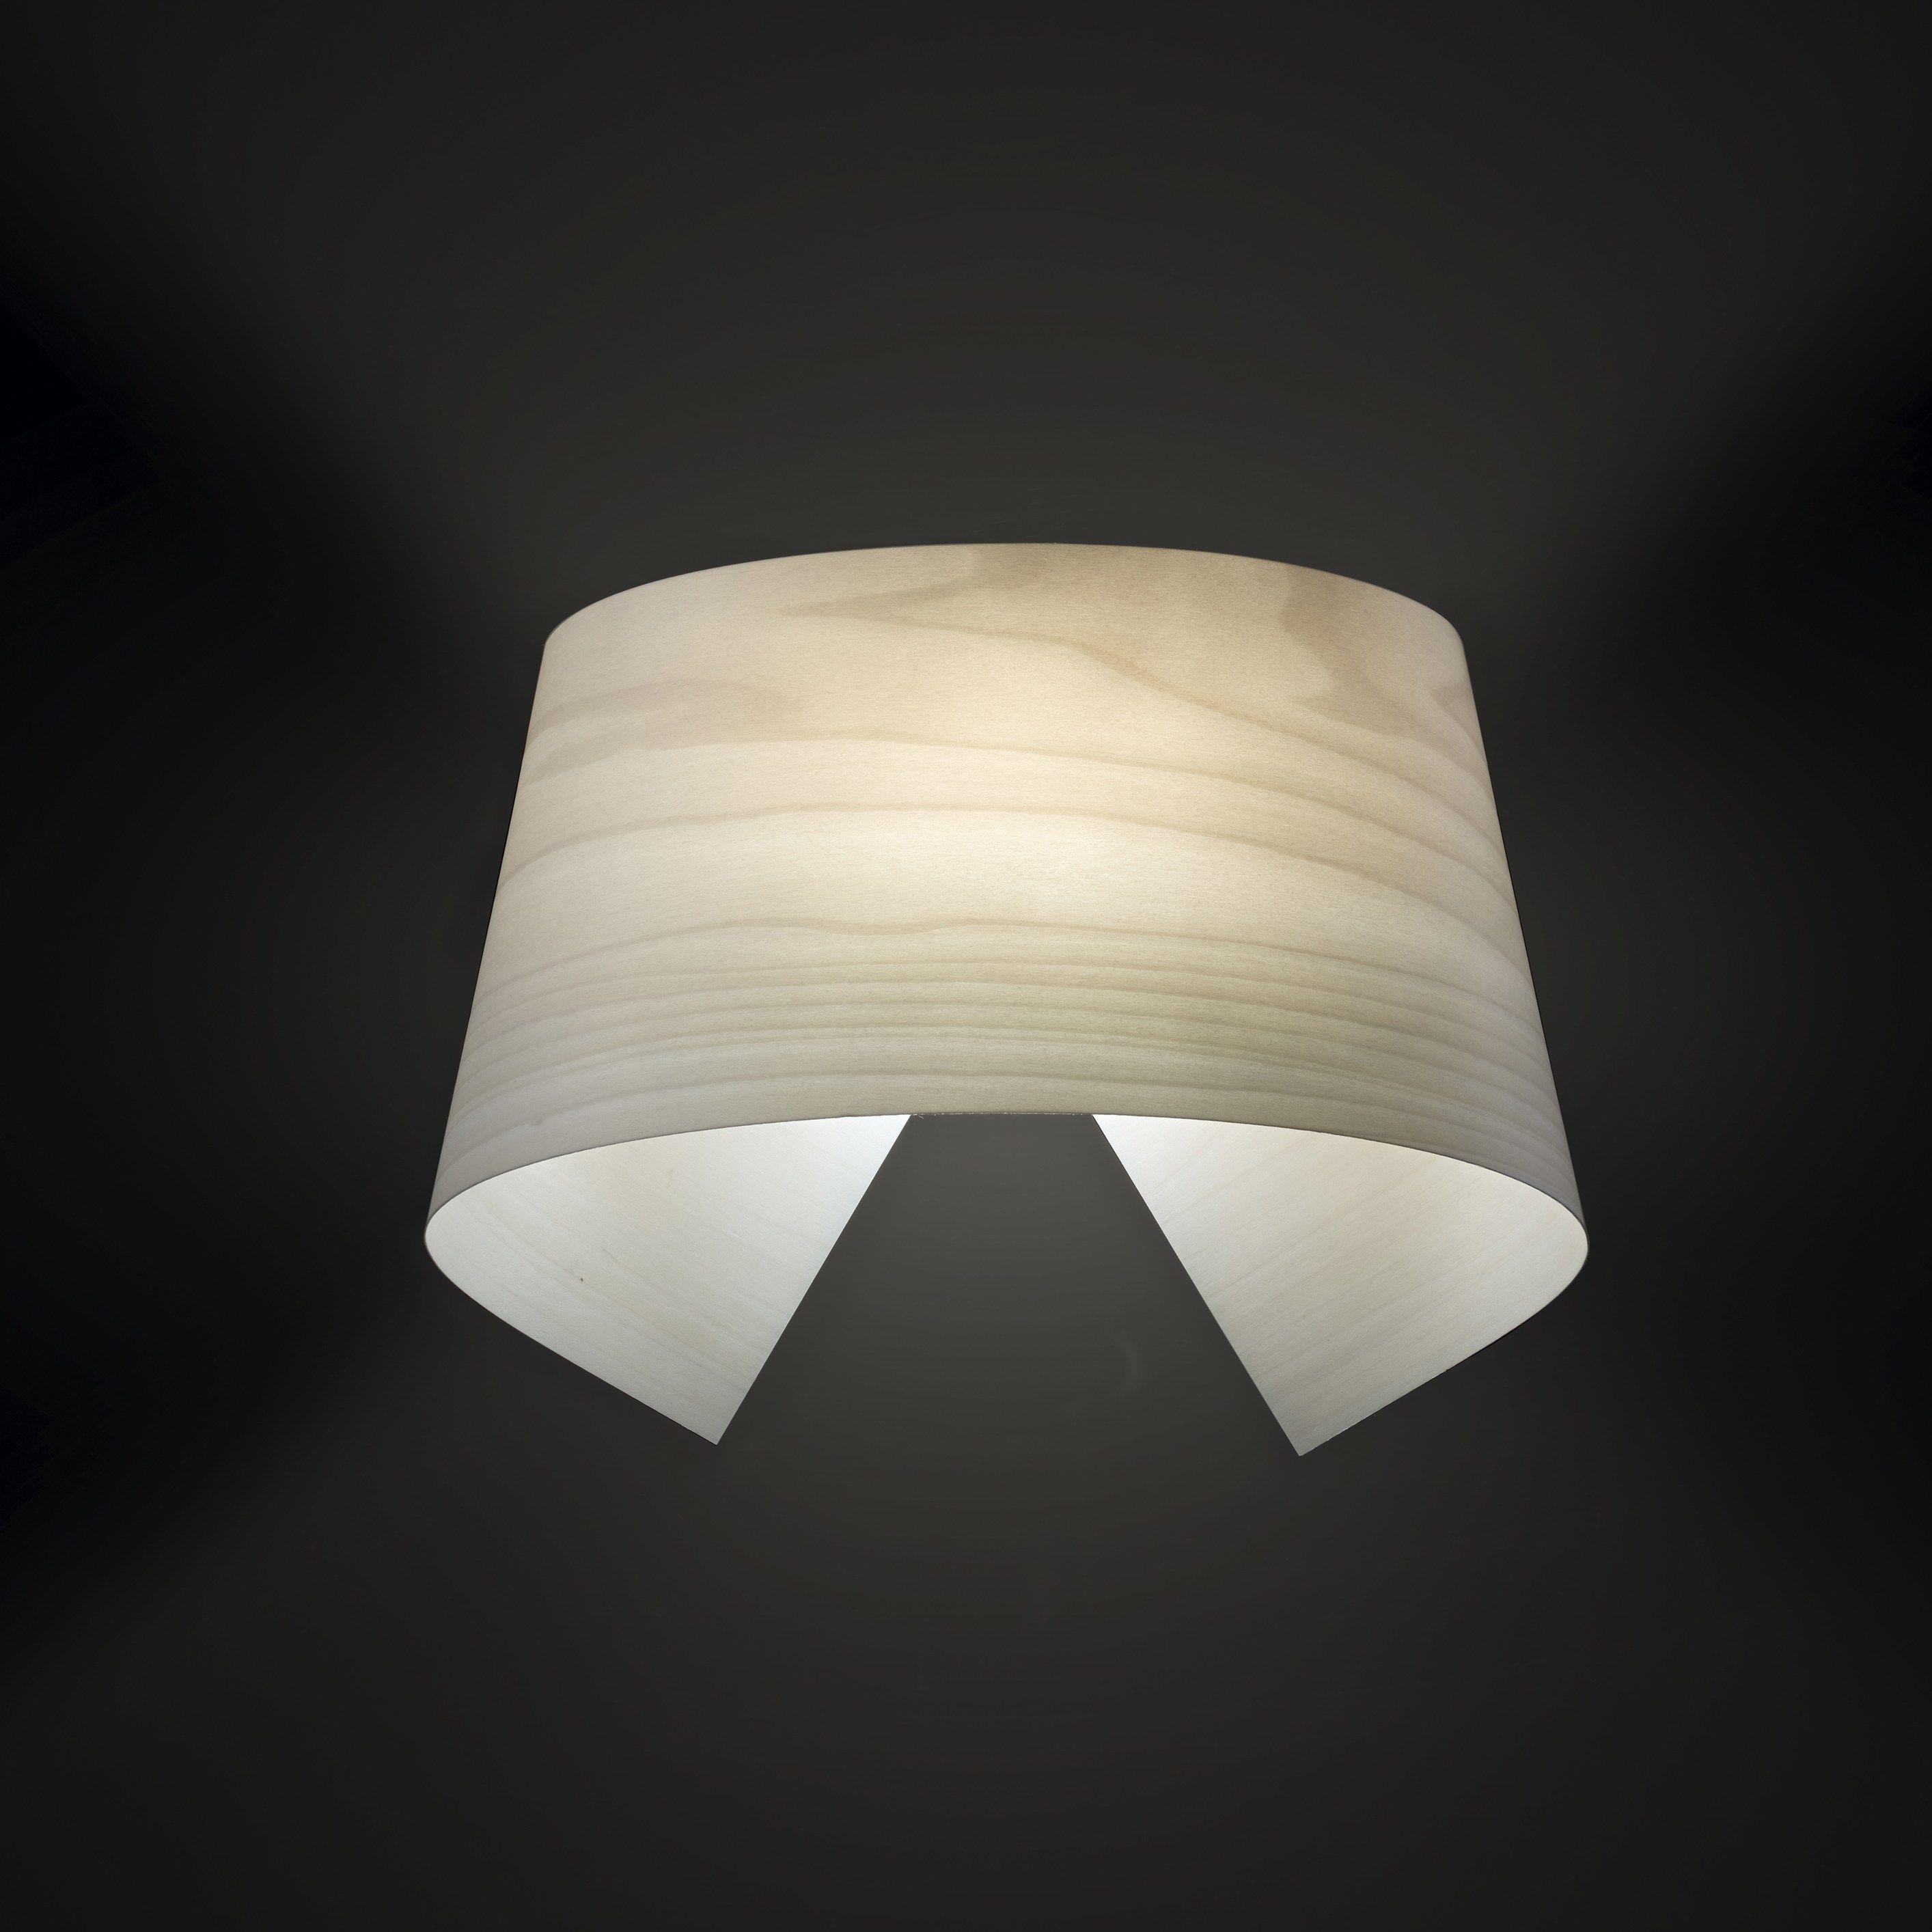 indirect light handmade led wall light hi collar a by lzf. Black Bedroom Furniture Sets. Home Design Ideas